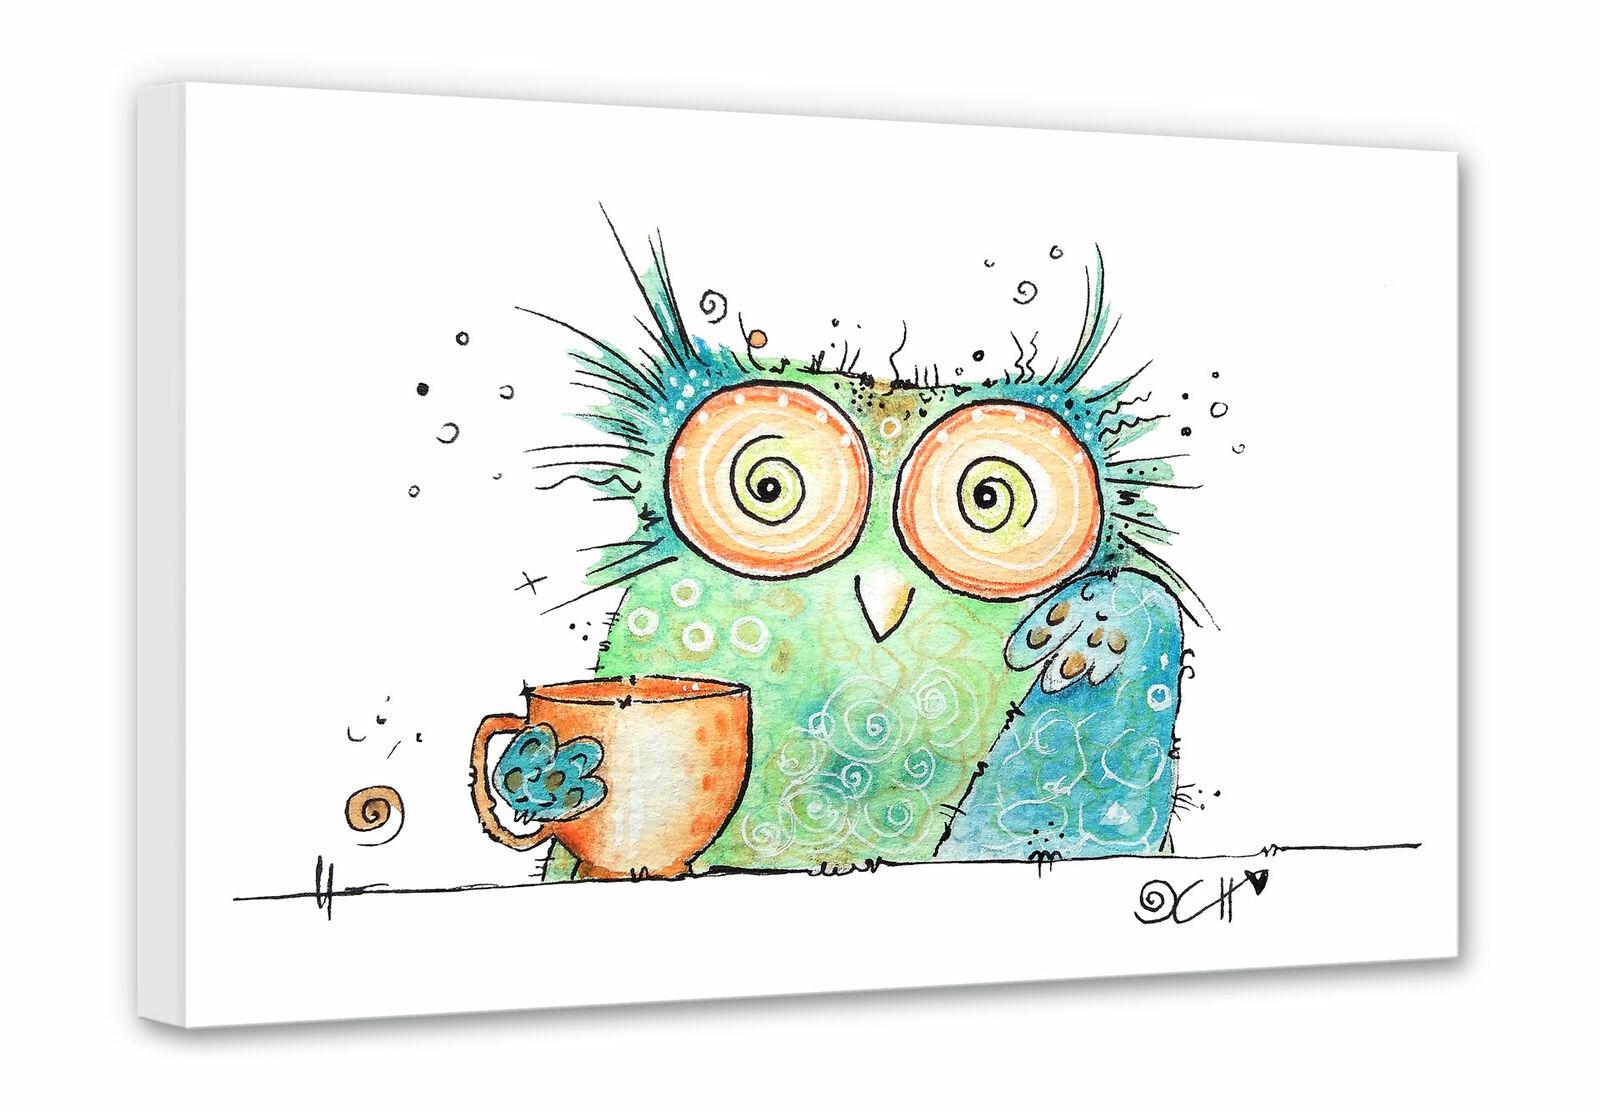 Leinwandbild Hagenmeyer - Coffee Leinwanddruck Wandbild gerahmt Wanddeko Canvas